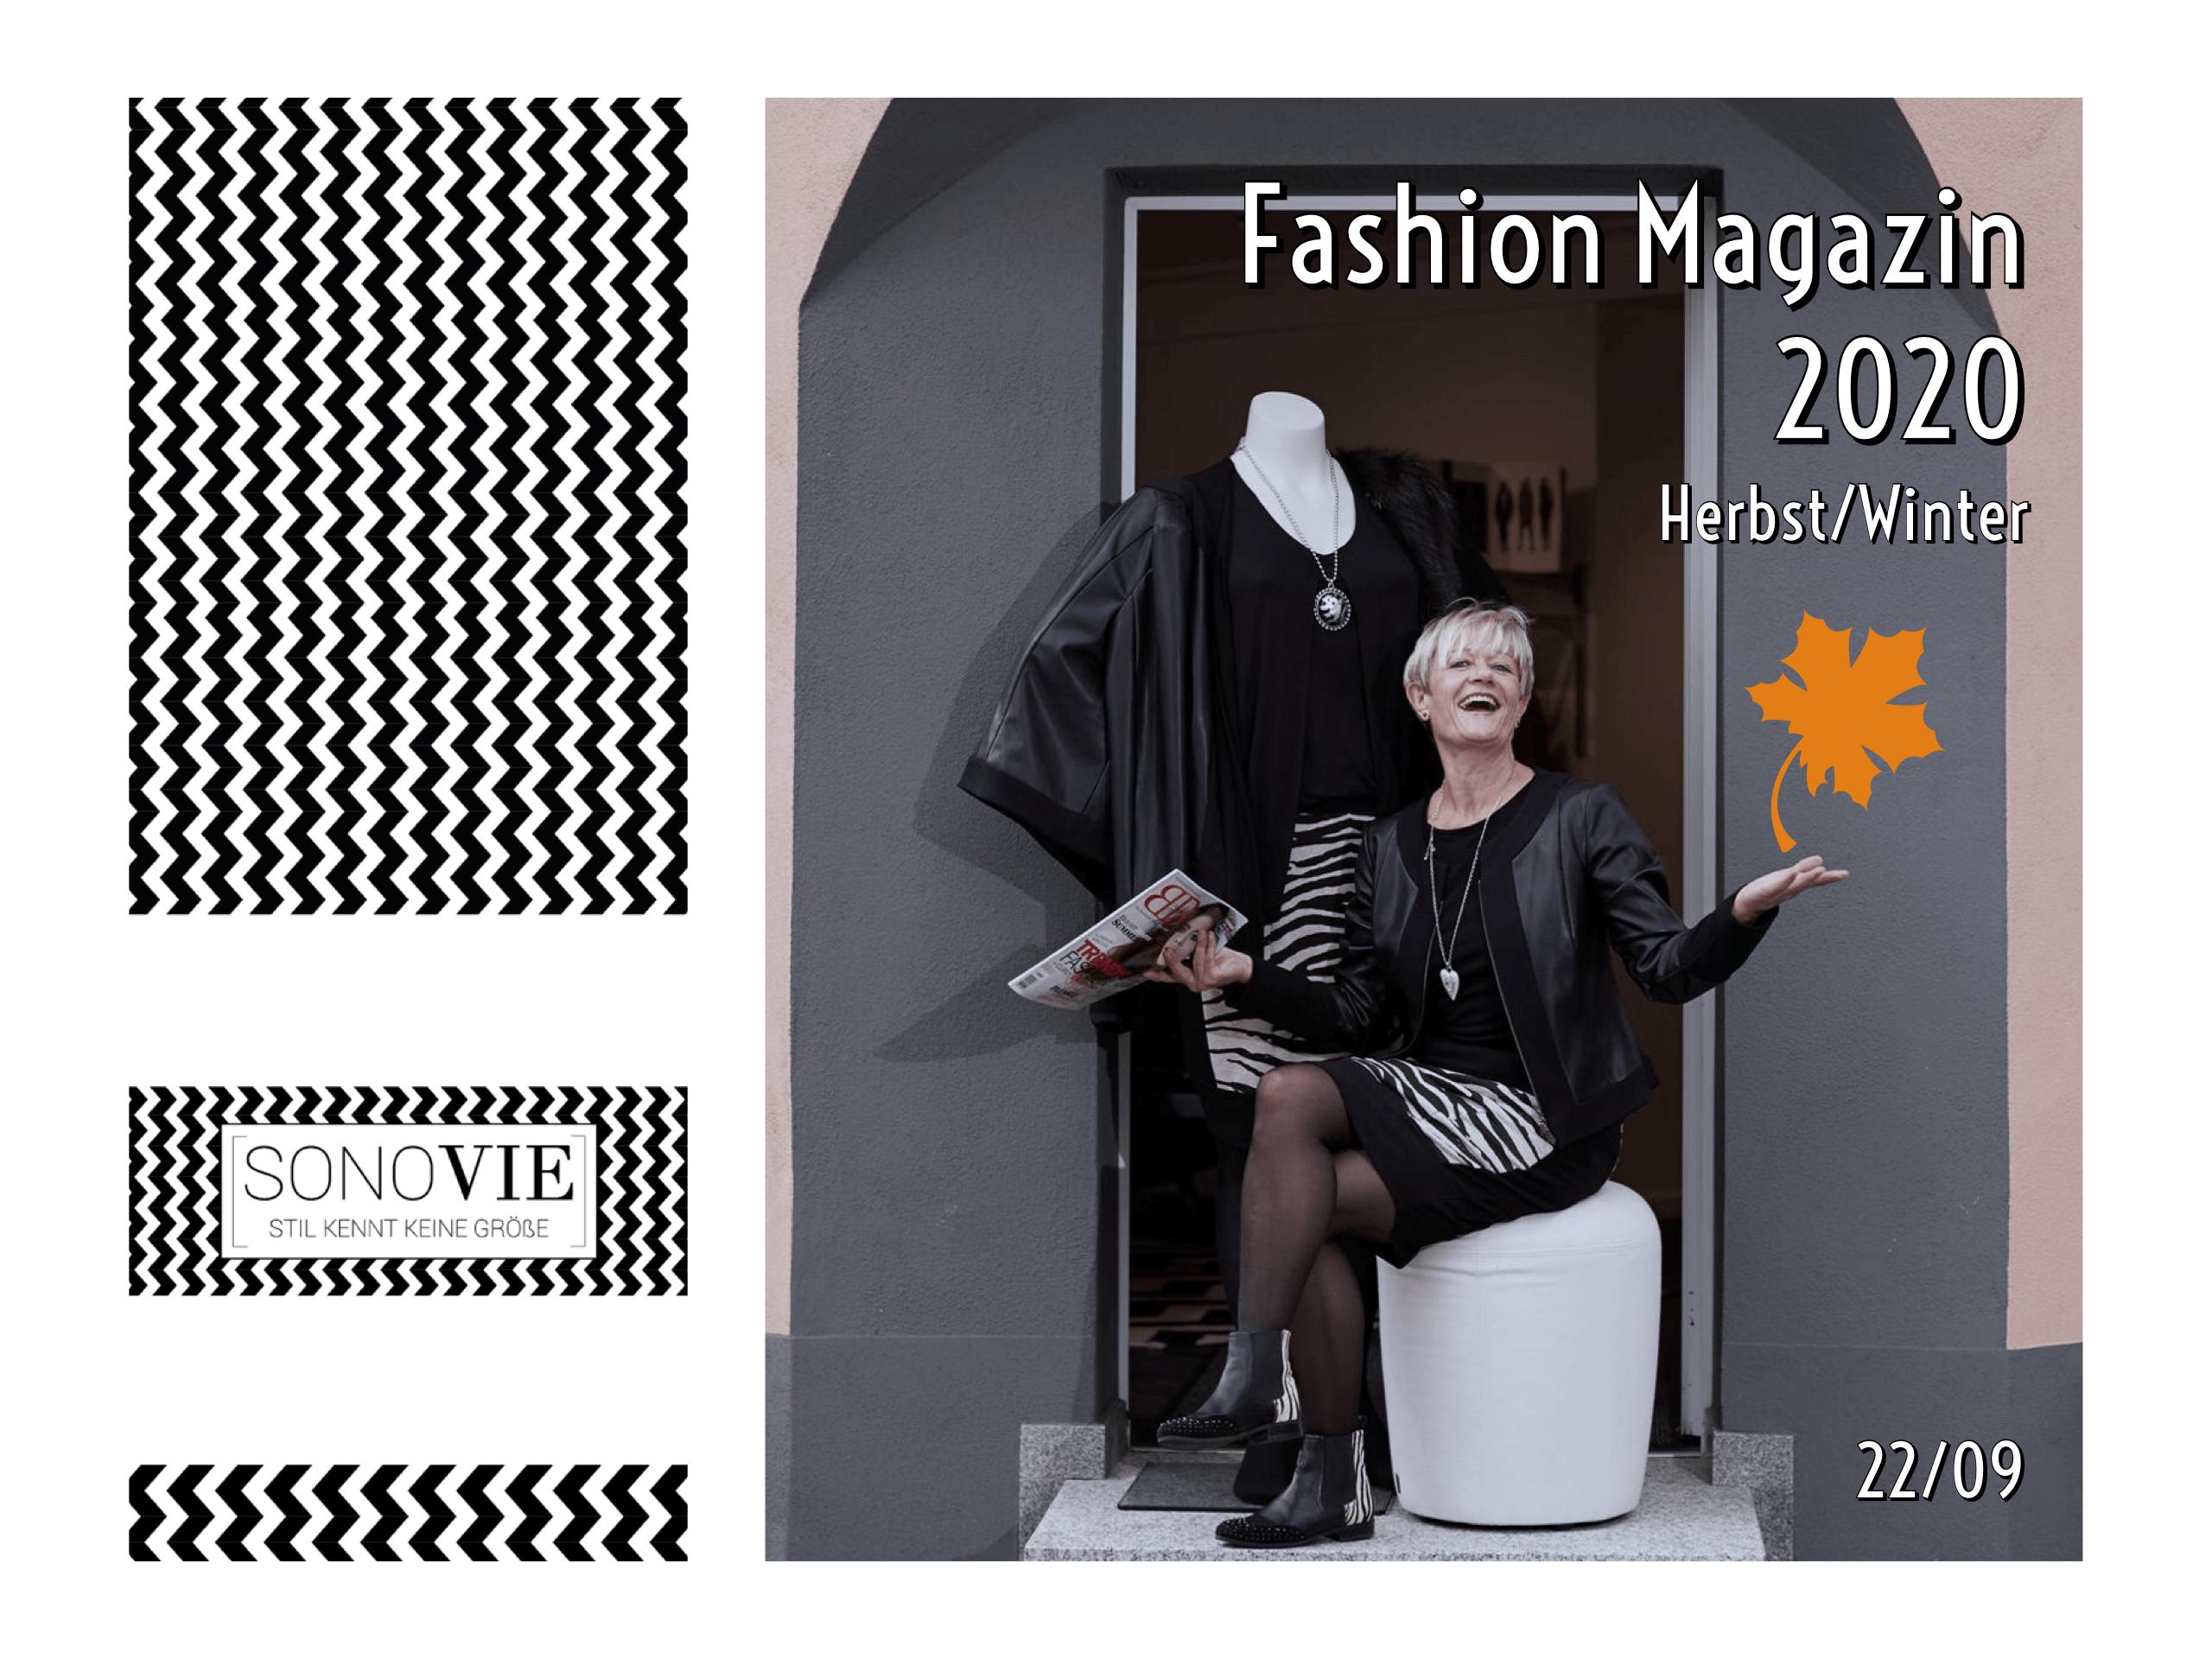 Fashion Magazin 2020 Herbst/Winter